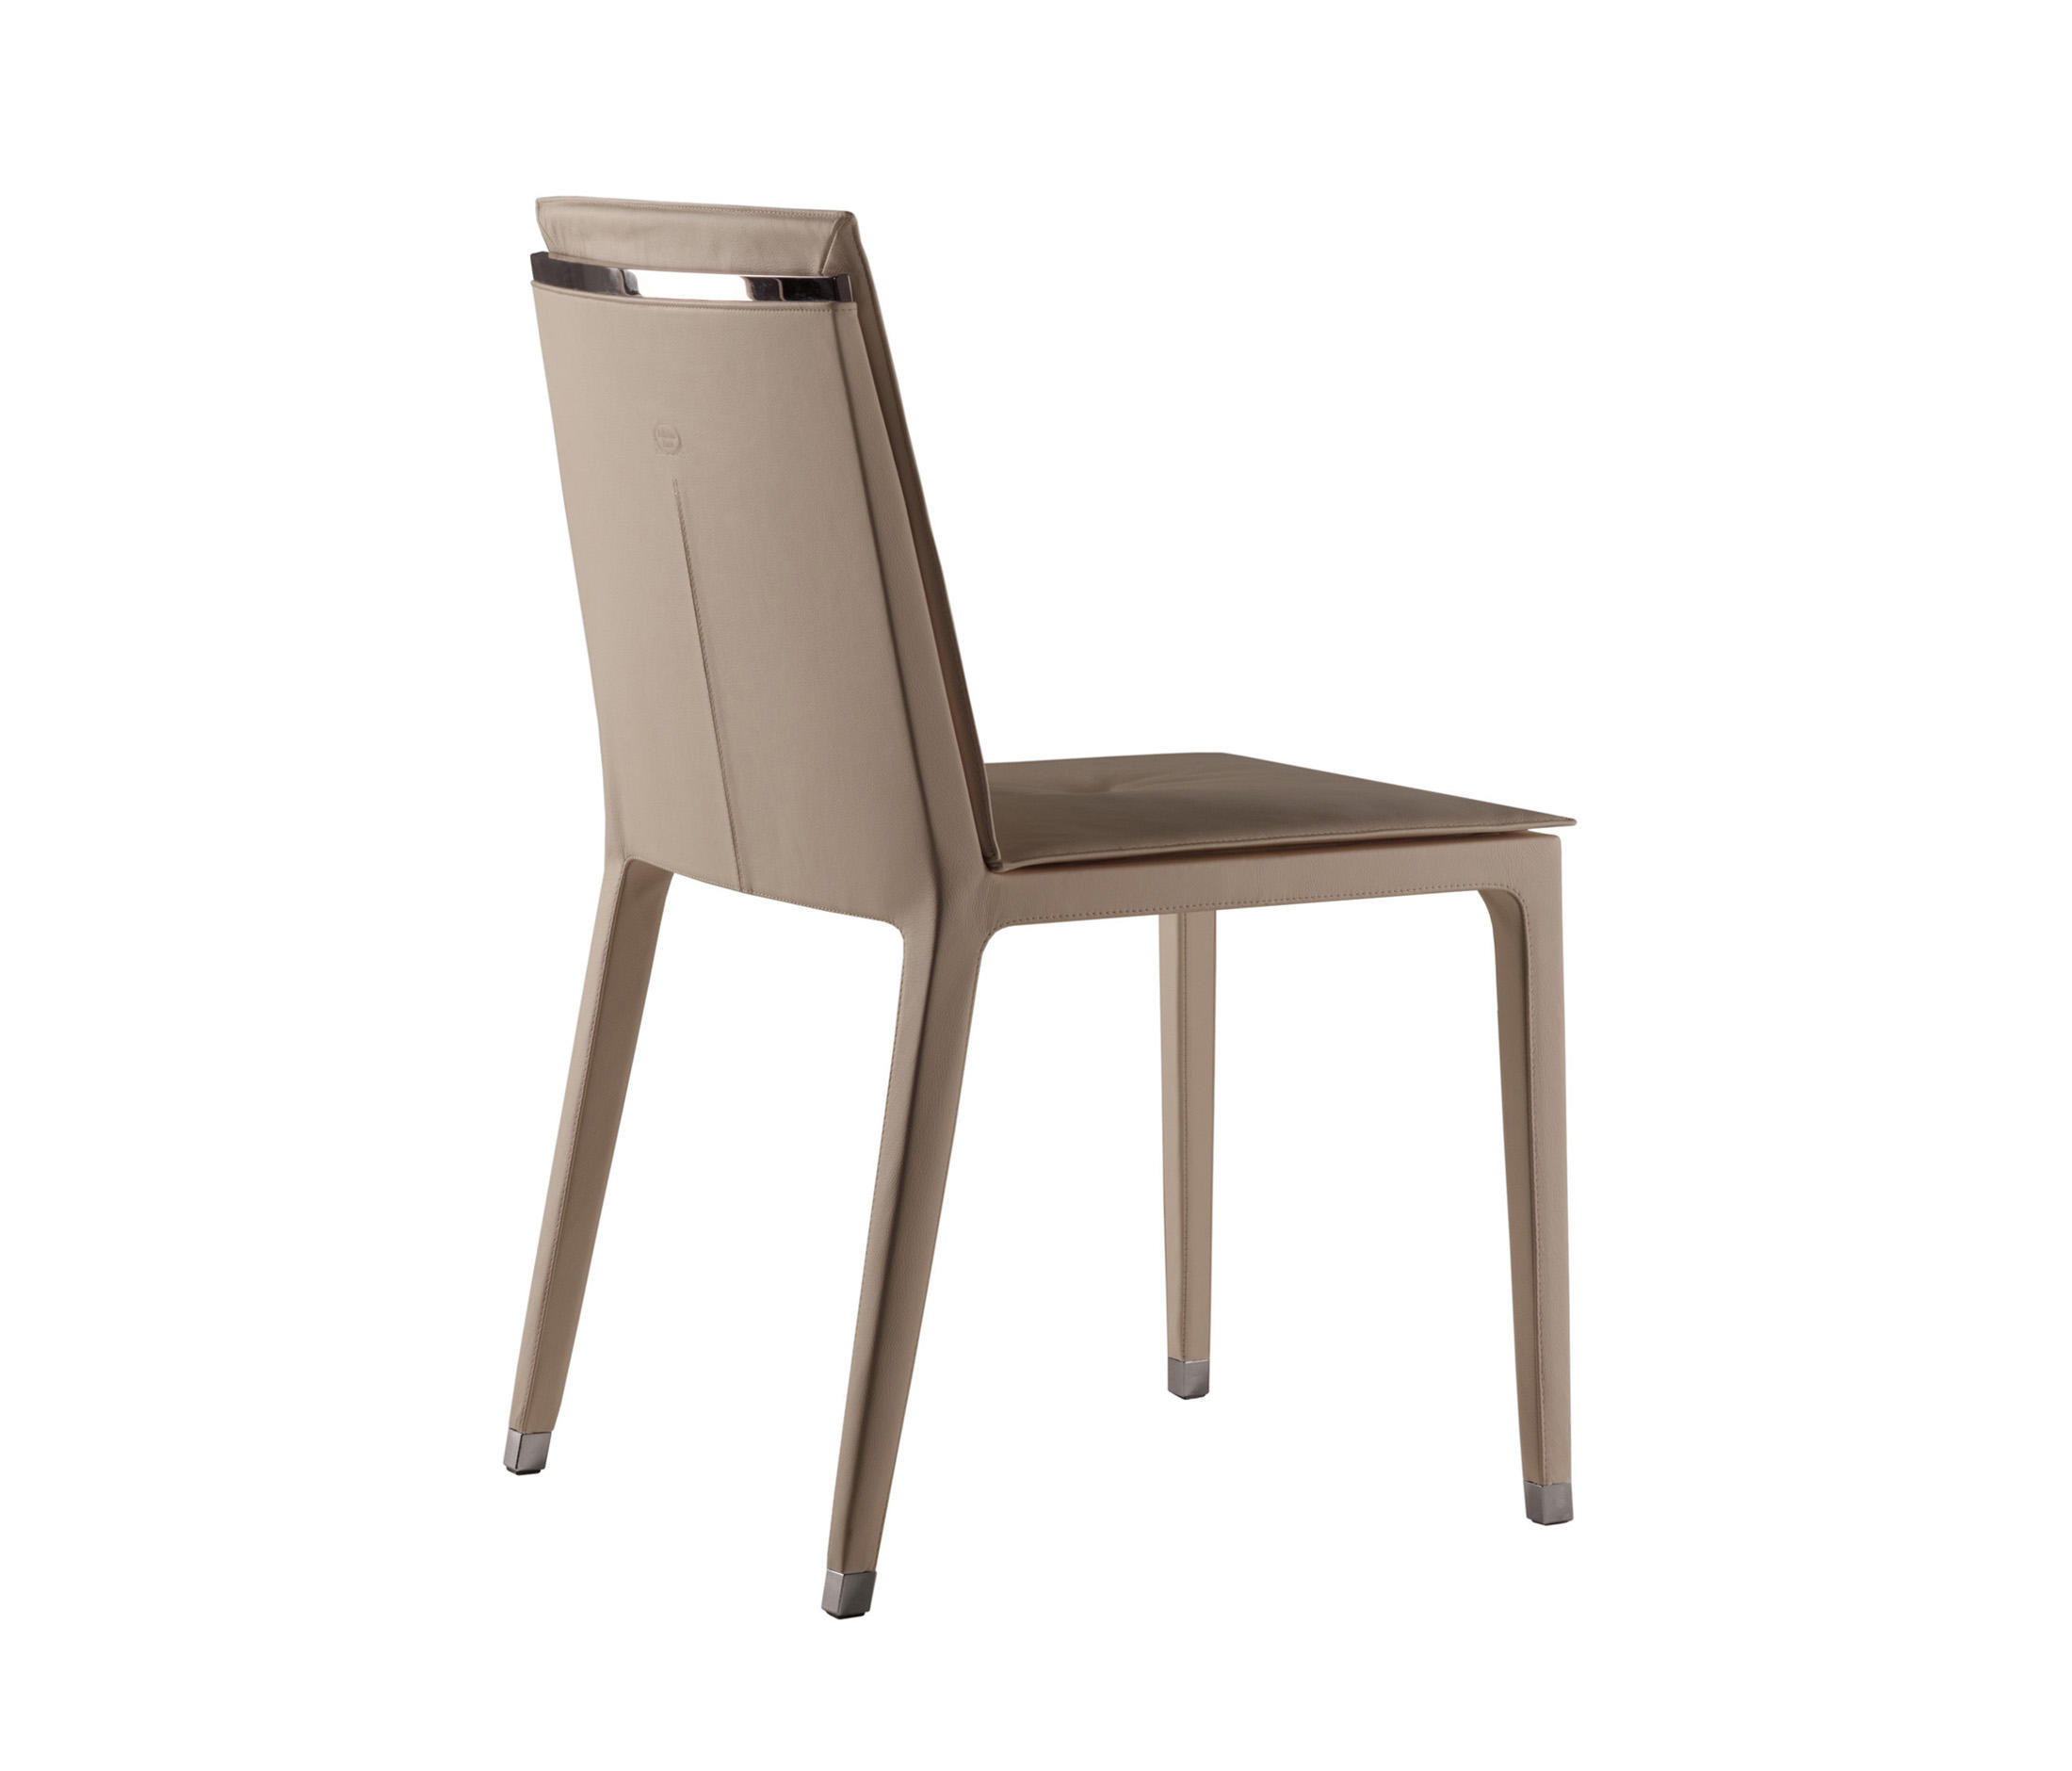 Fitzgerald Poltrona Frau.Fitzgerald Chairs From Poltrona Frau Architonic